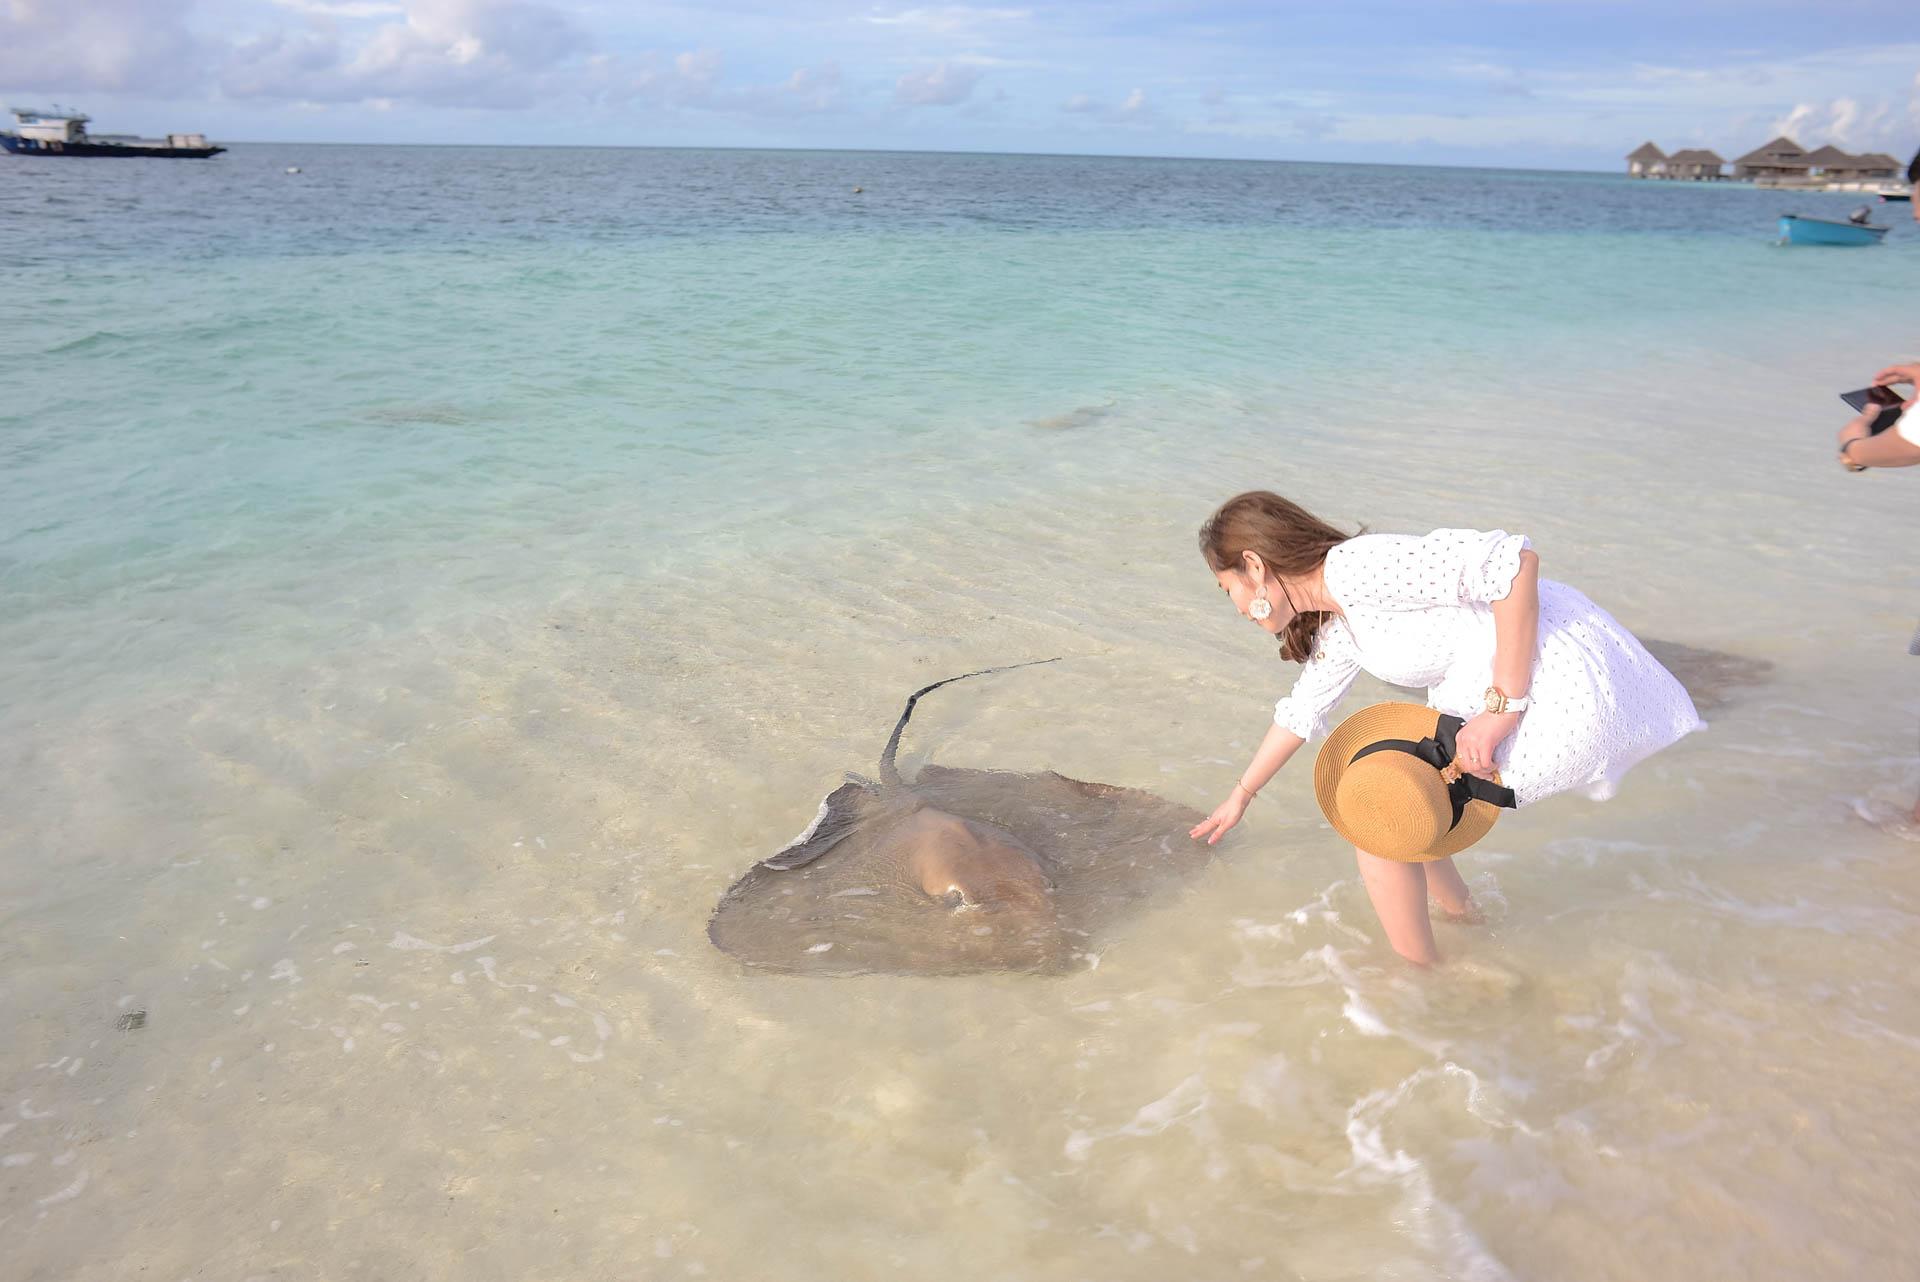 Chin Siew and Chin Yee Honeymoon in Maldives at Huvafen Fushi Resort Under Water Spa 30